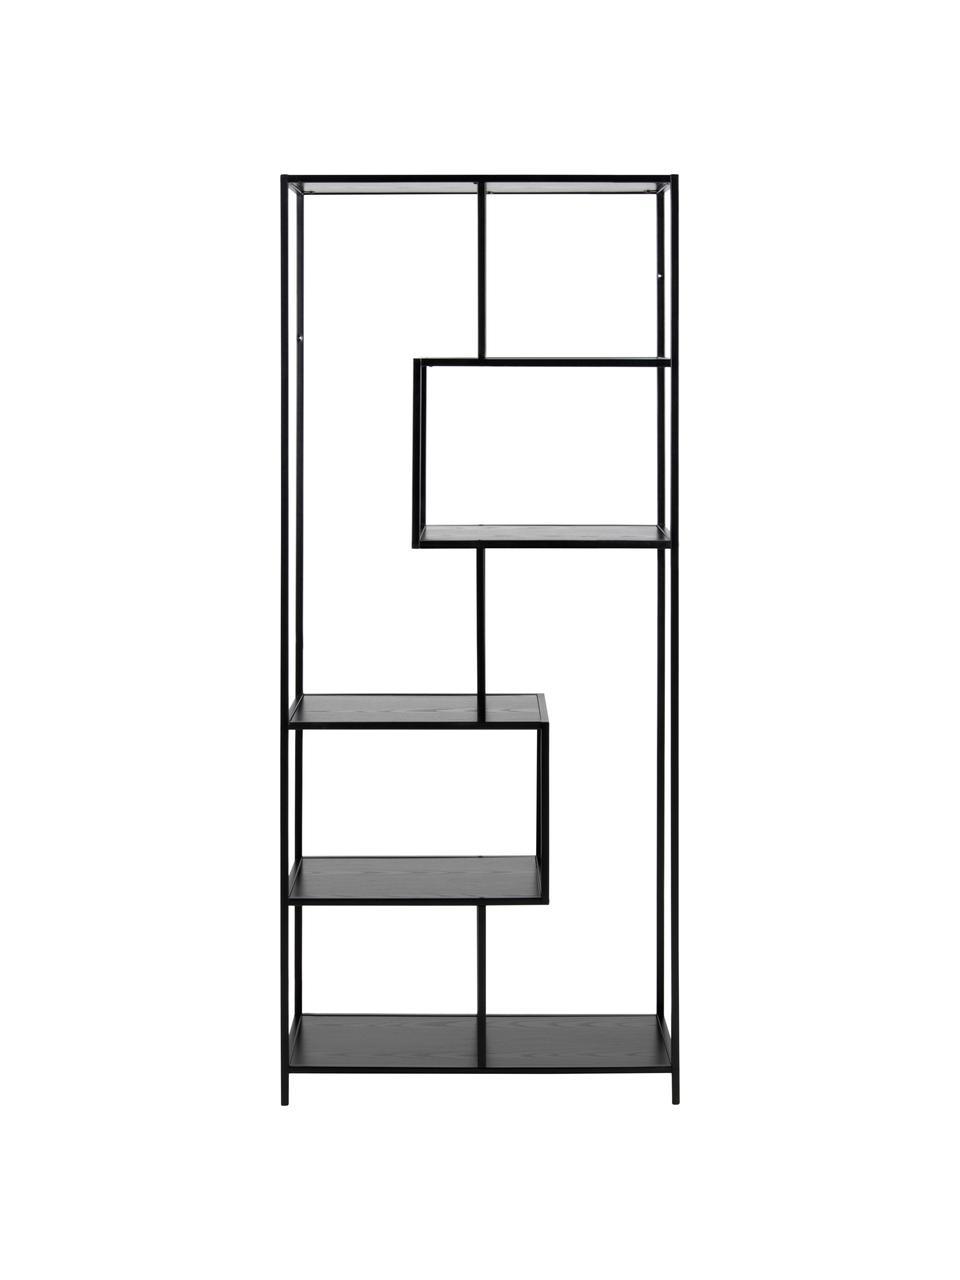 Wandrek Seaford van hout en metaal, Plank: gelamineerd MDF, Frame: gepoedercoat metaal, Zwart, 77 x 185 cm